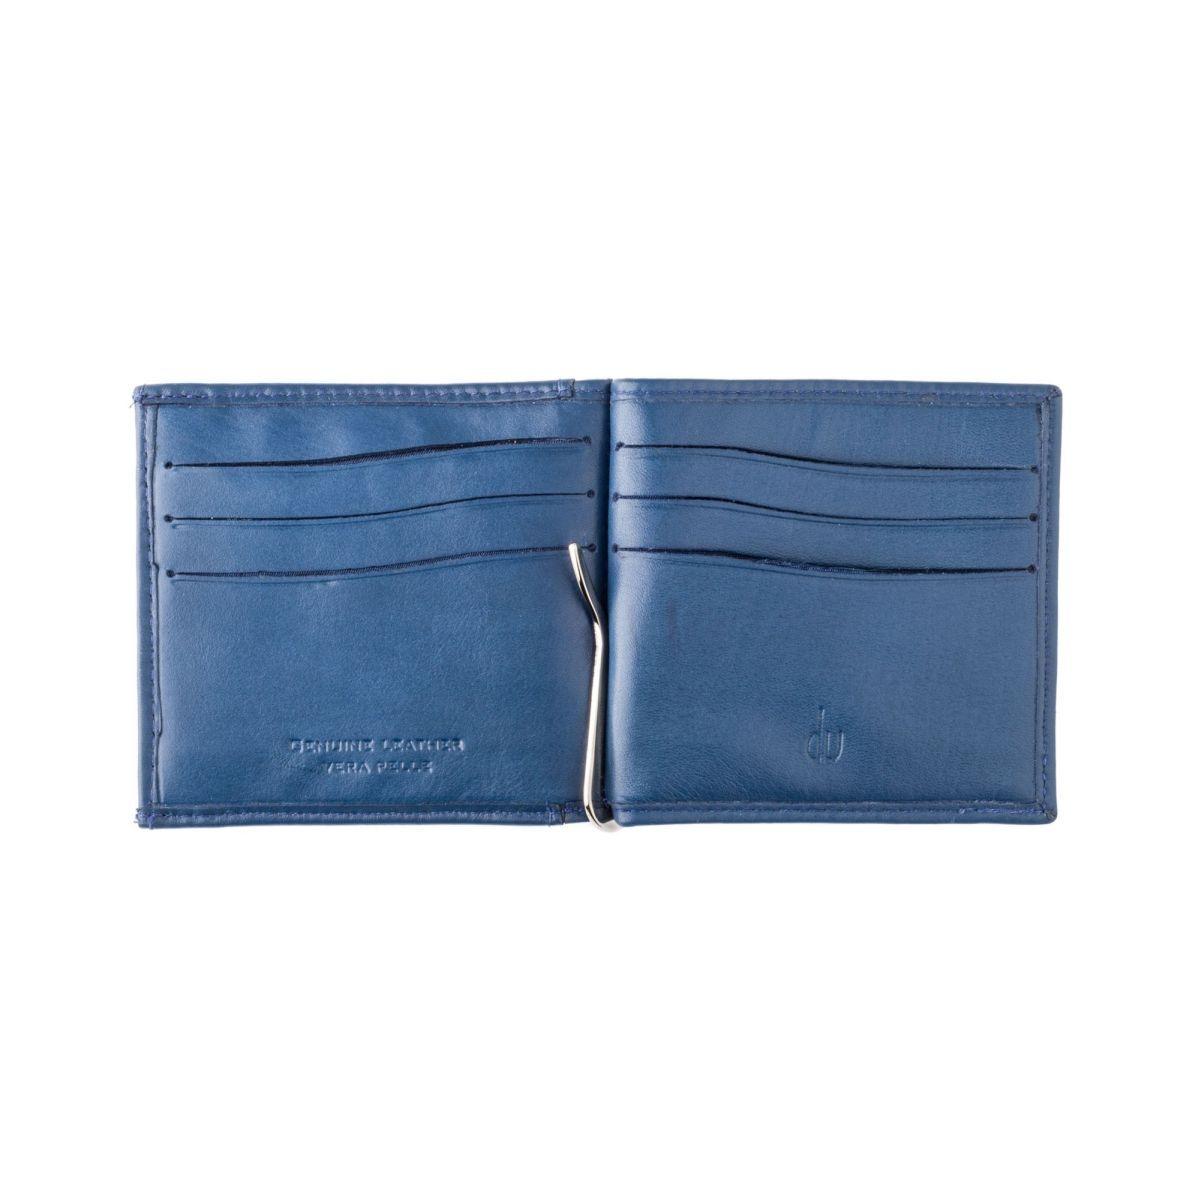 dv ארנק עור איטלקי עם קליפס ותא למטבעות - כחול